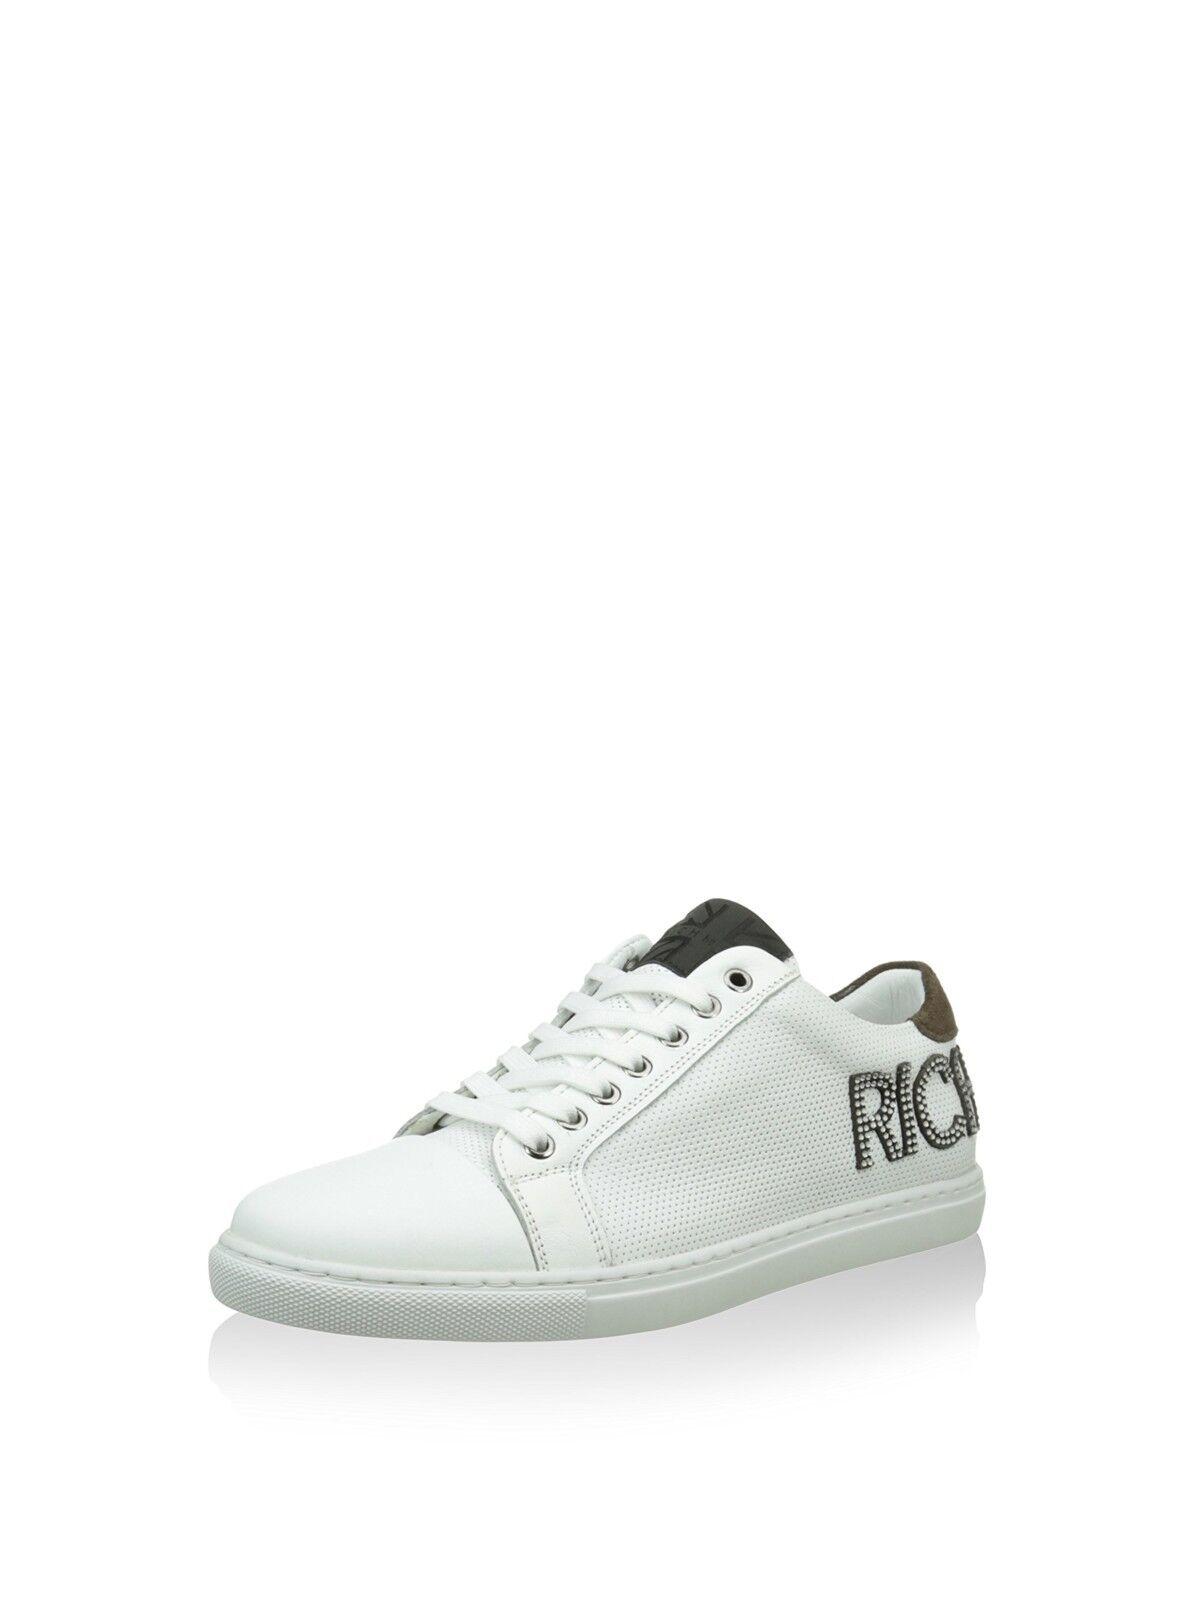 Richmond scarpe da donna bianche 41 EU